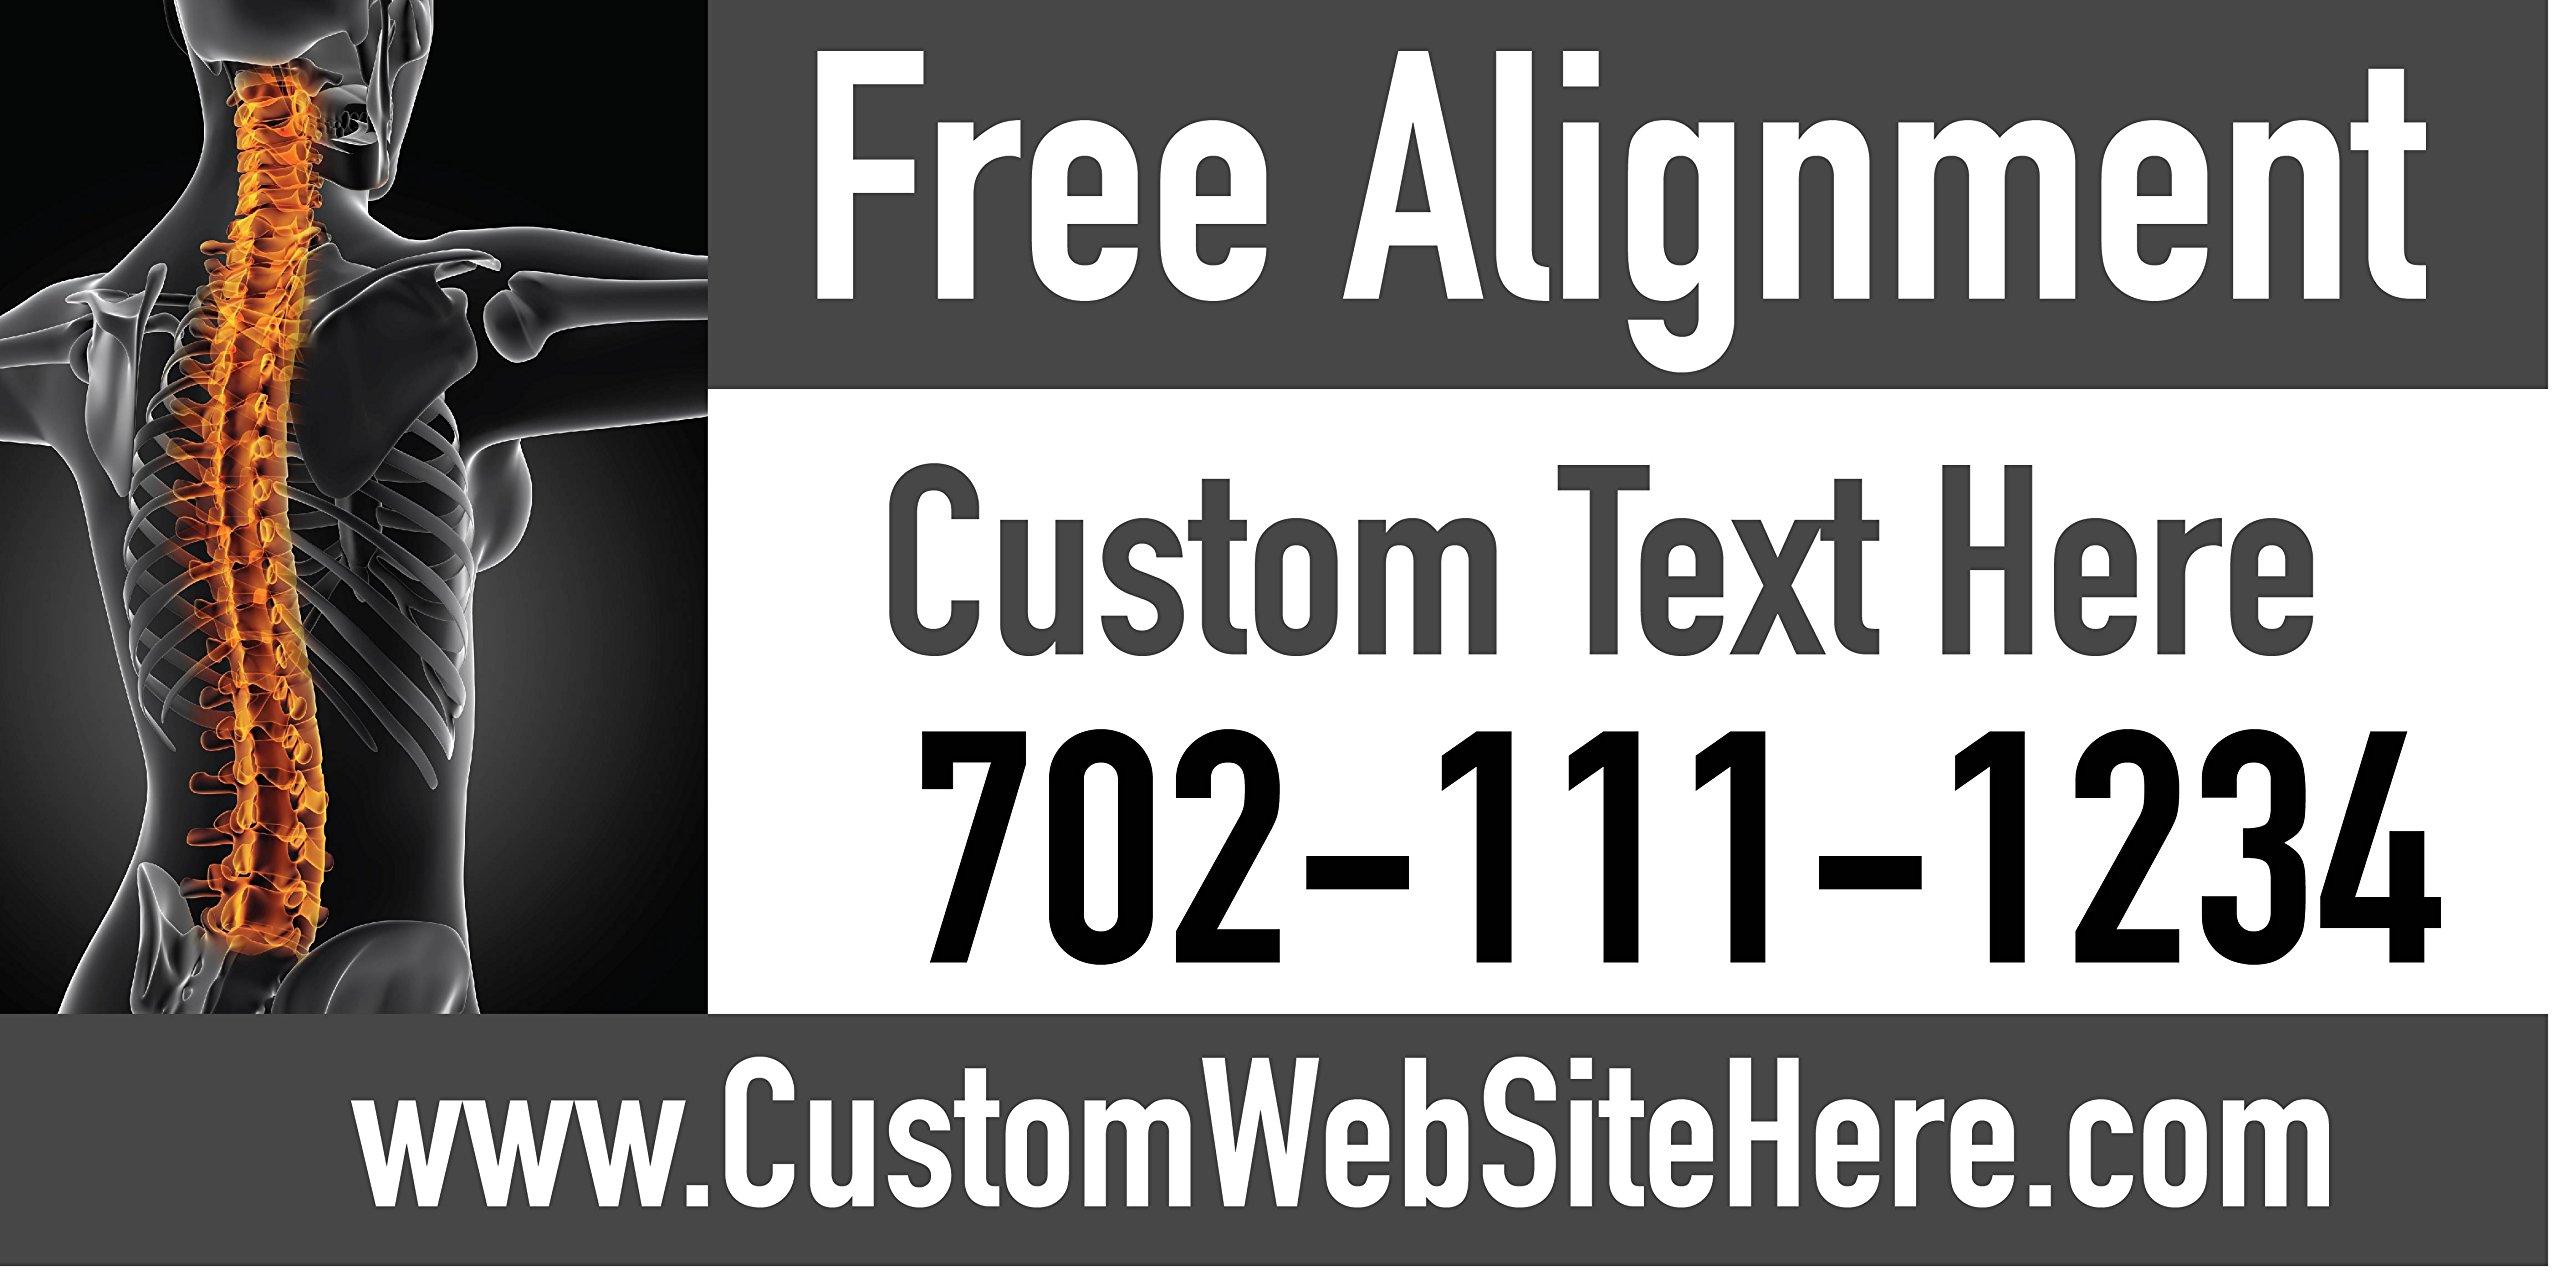 Custom Printed Chiropractic Banner - Free Alignment (10' x 5')